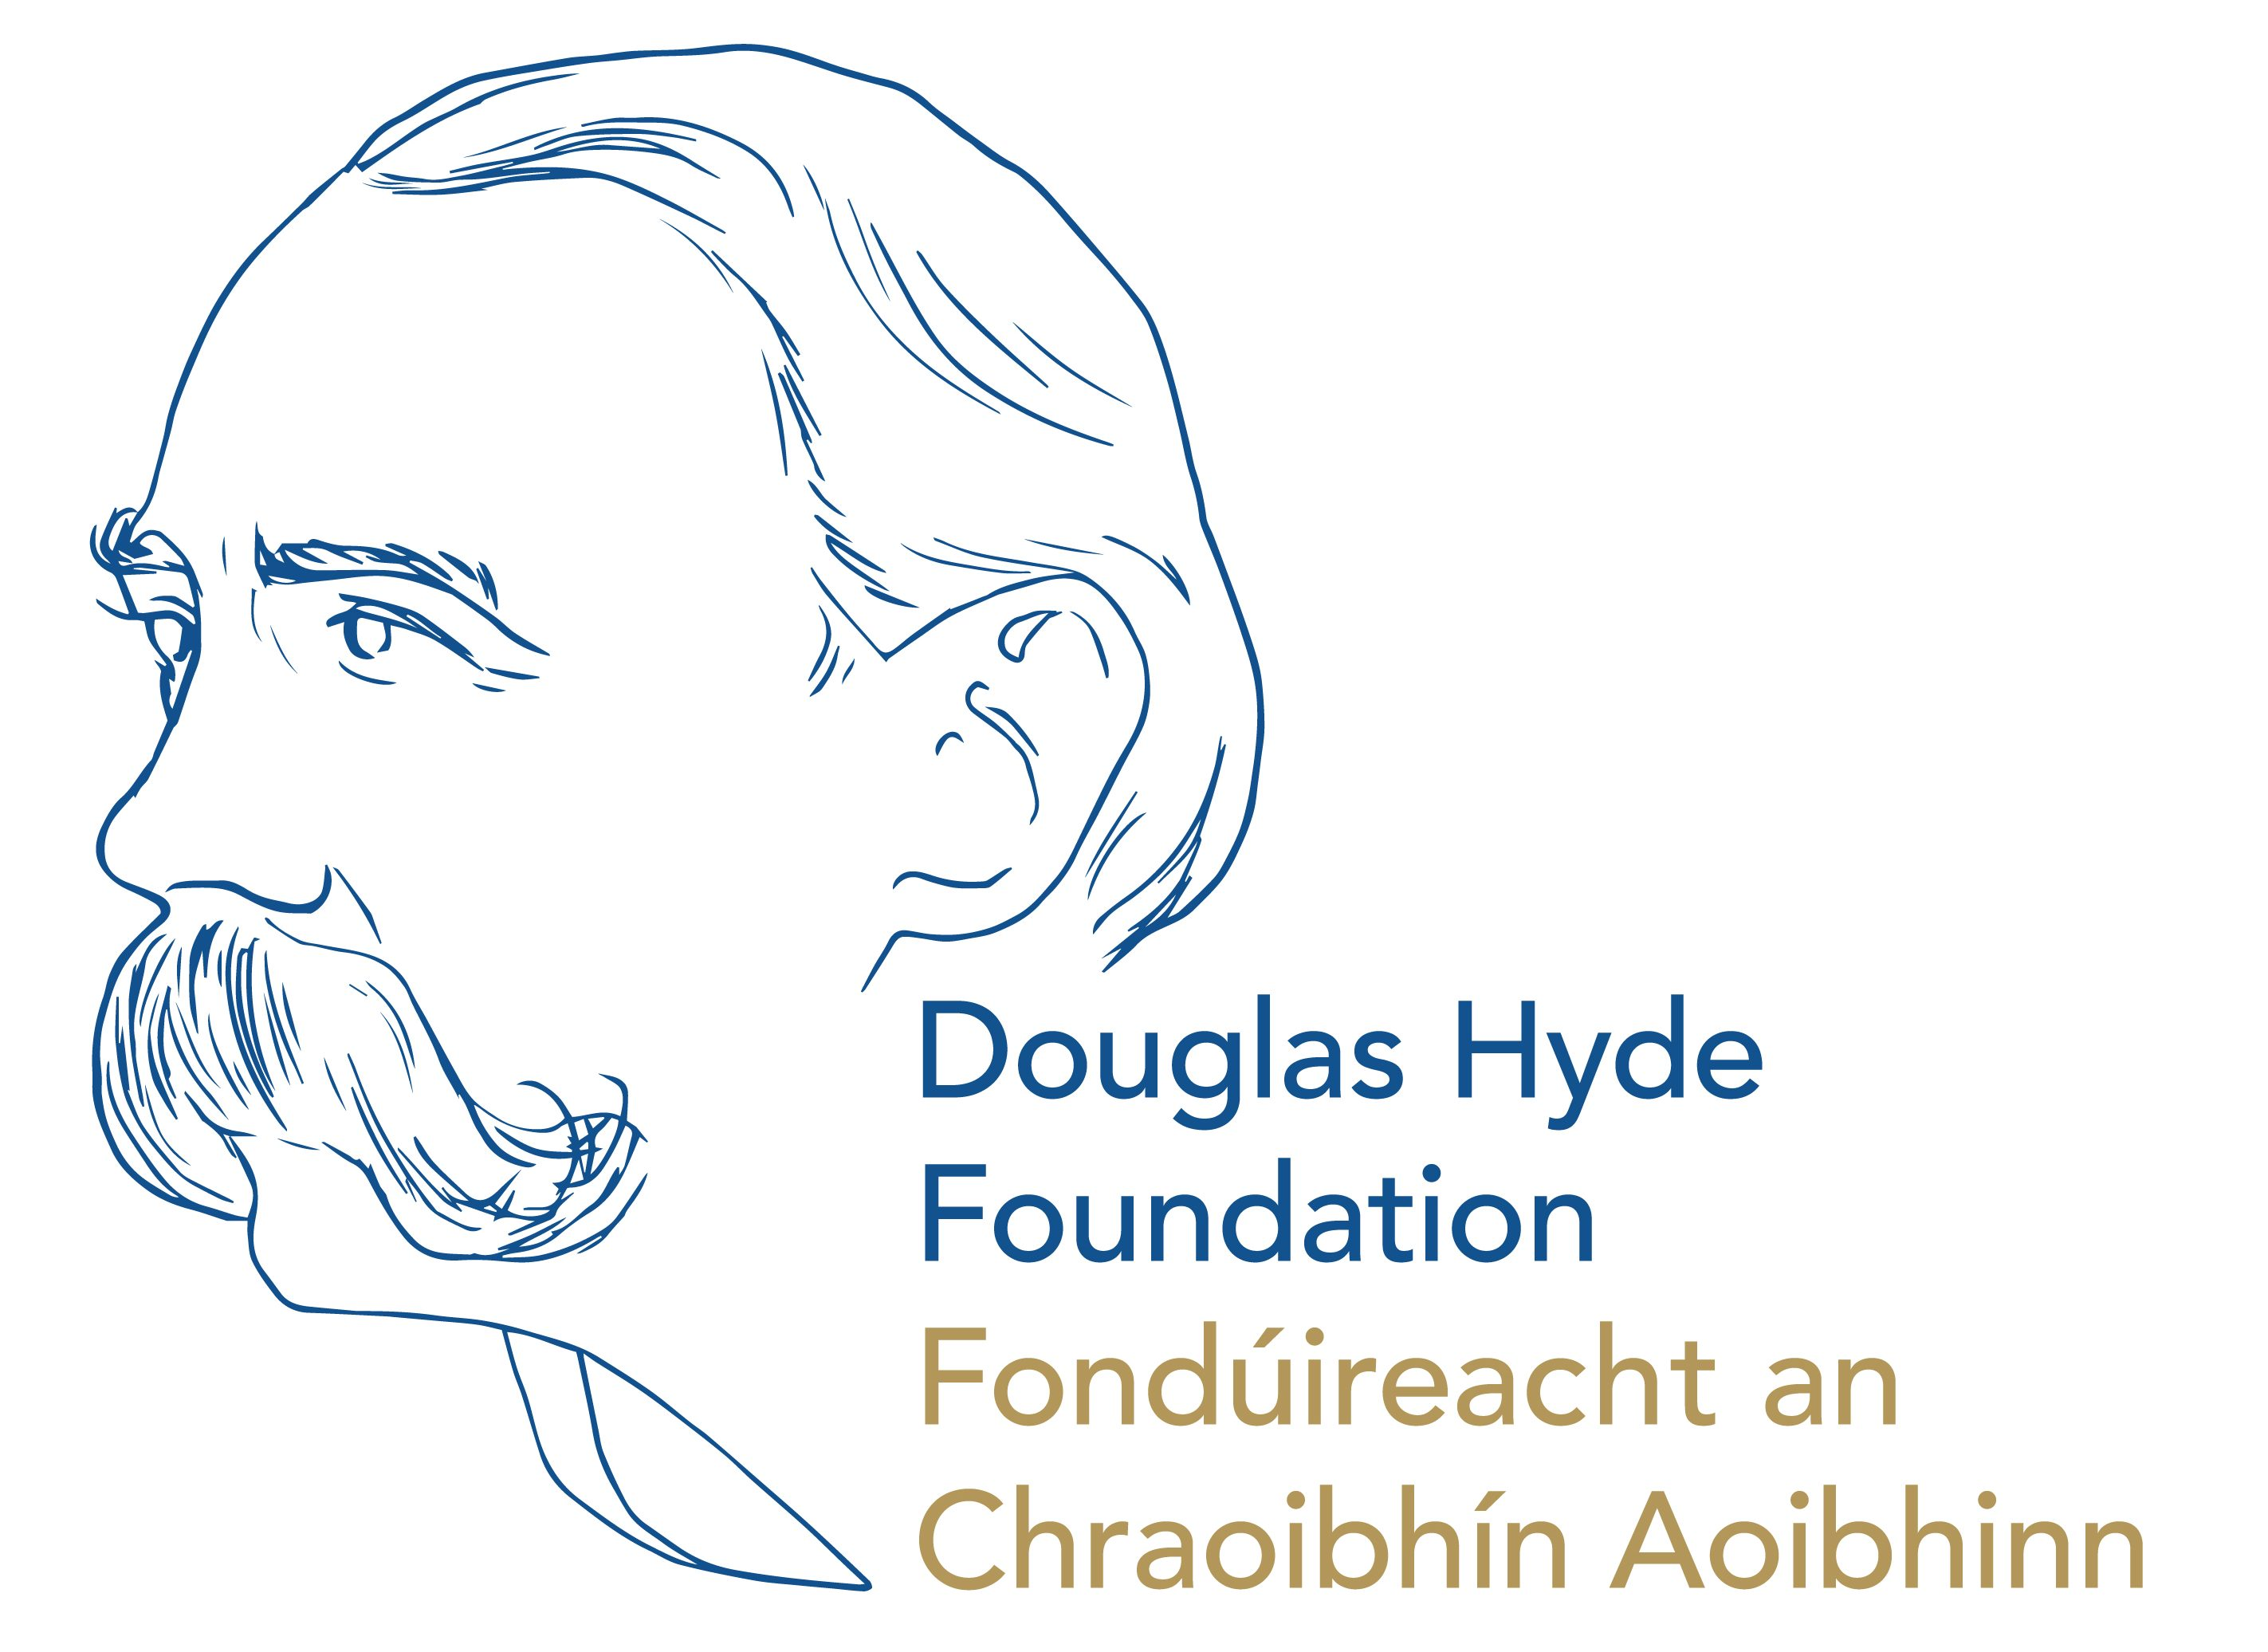 The Douglas Hyde Foundation